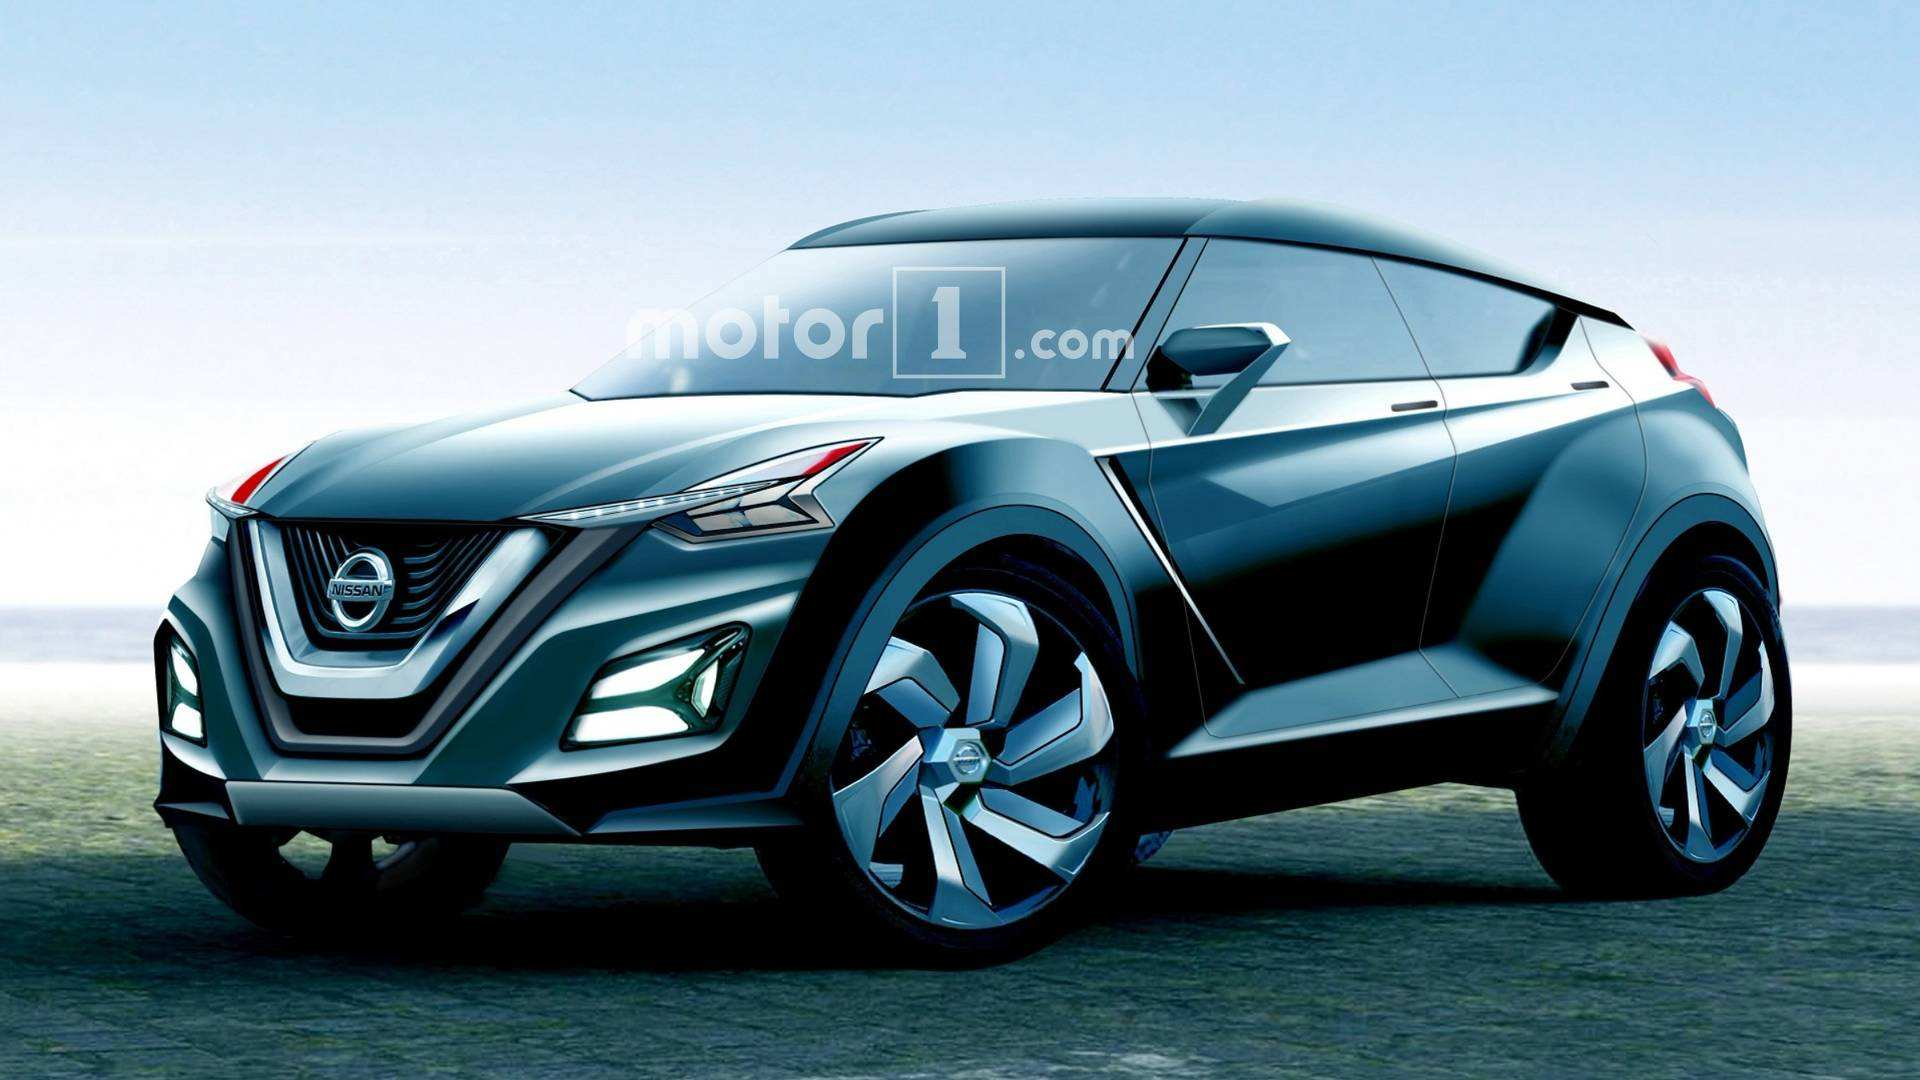 41 All New Nissan Juke 2020 Spesification for Nissan Juke 2020